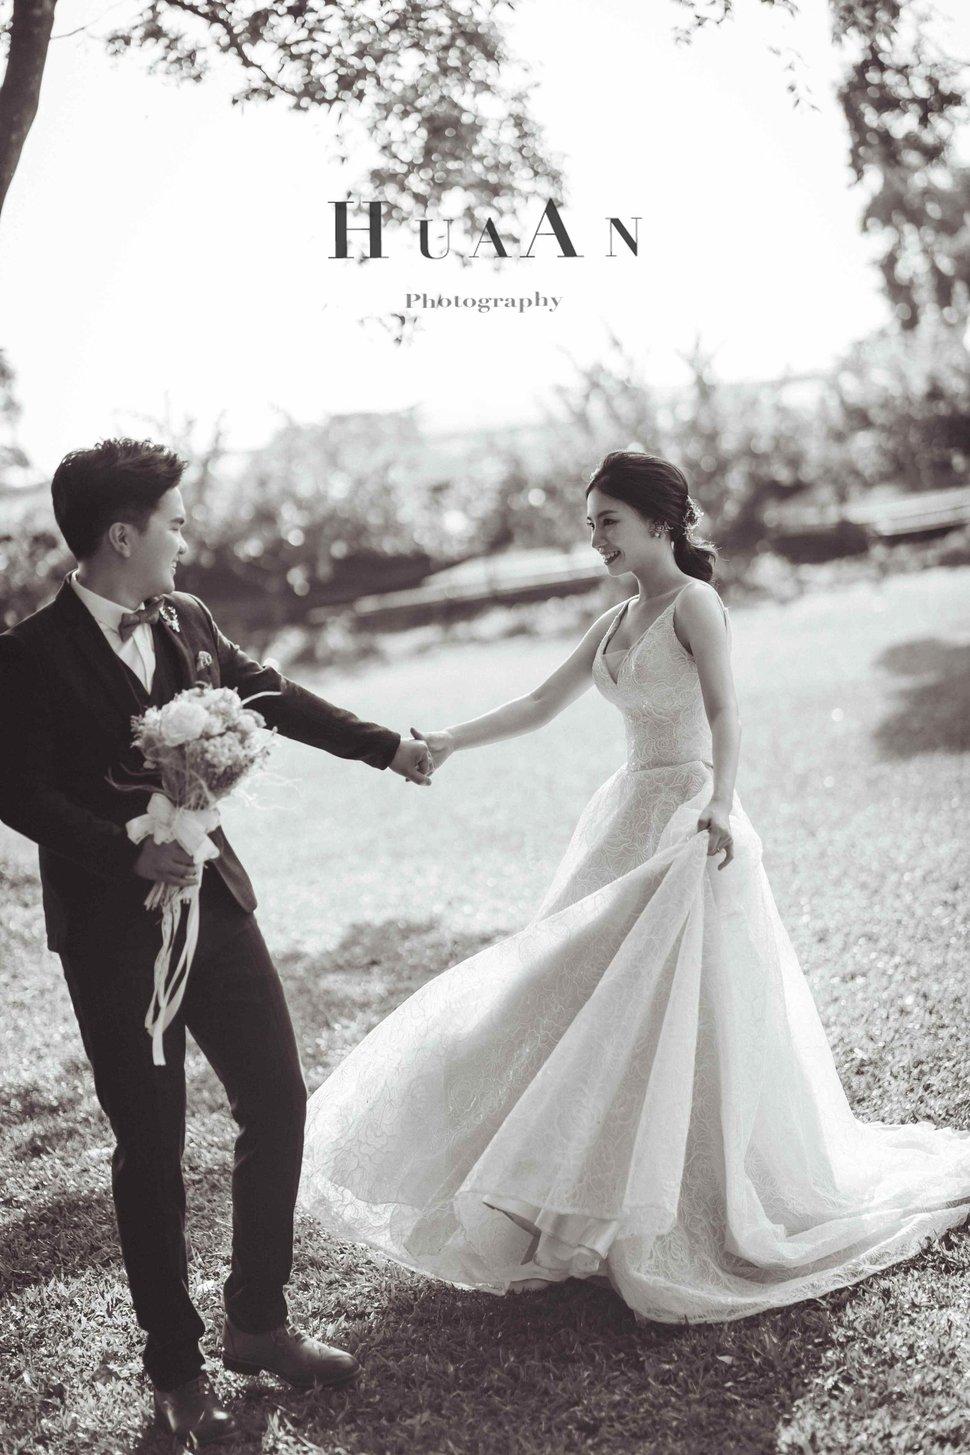 DSC04877 - Huaan Photography《結婚吧》